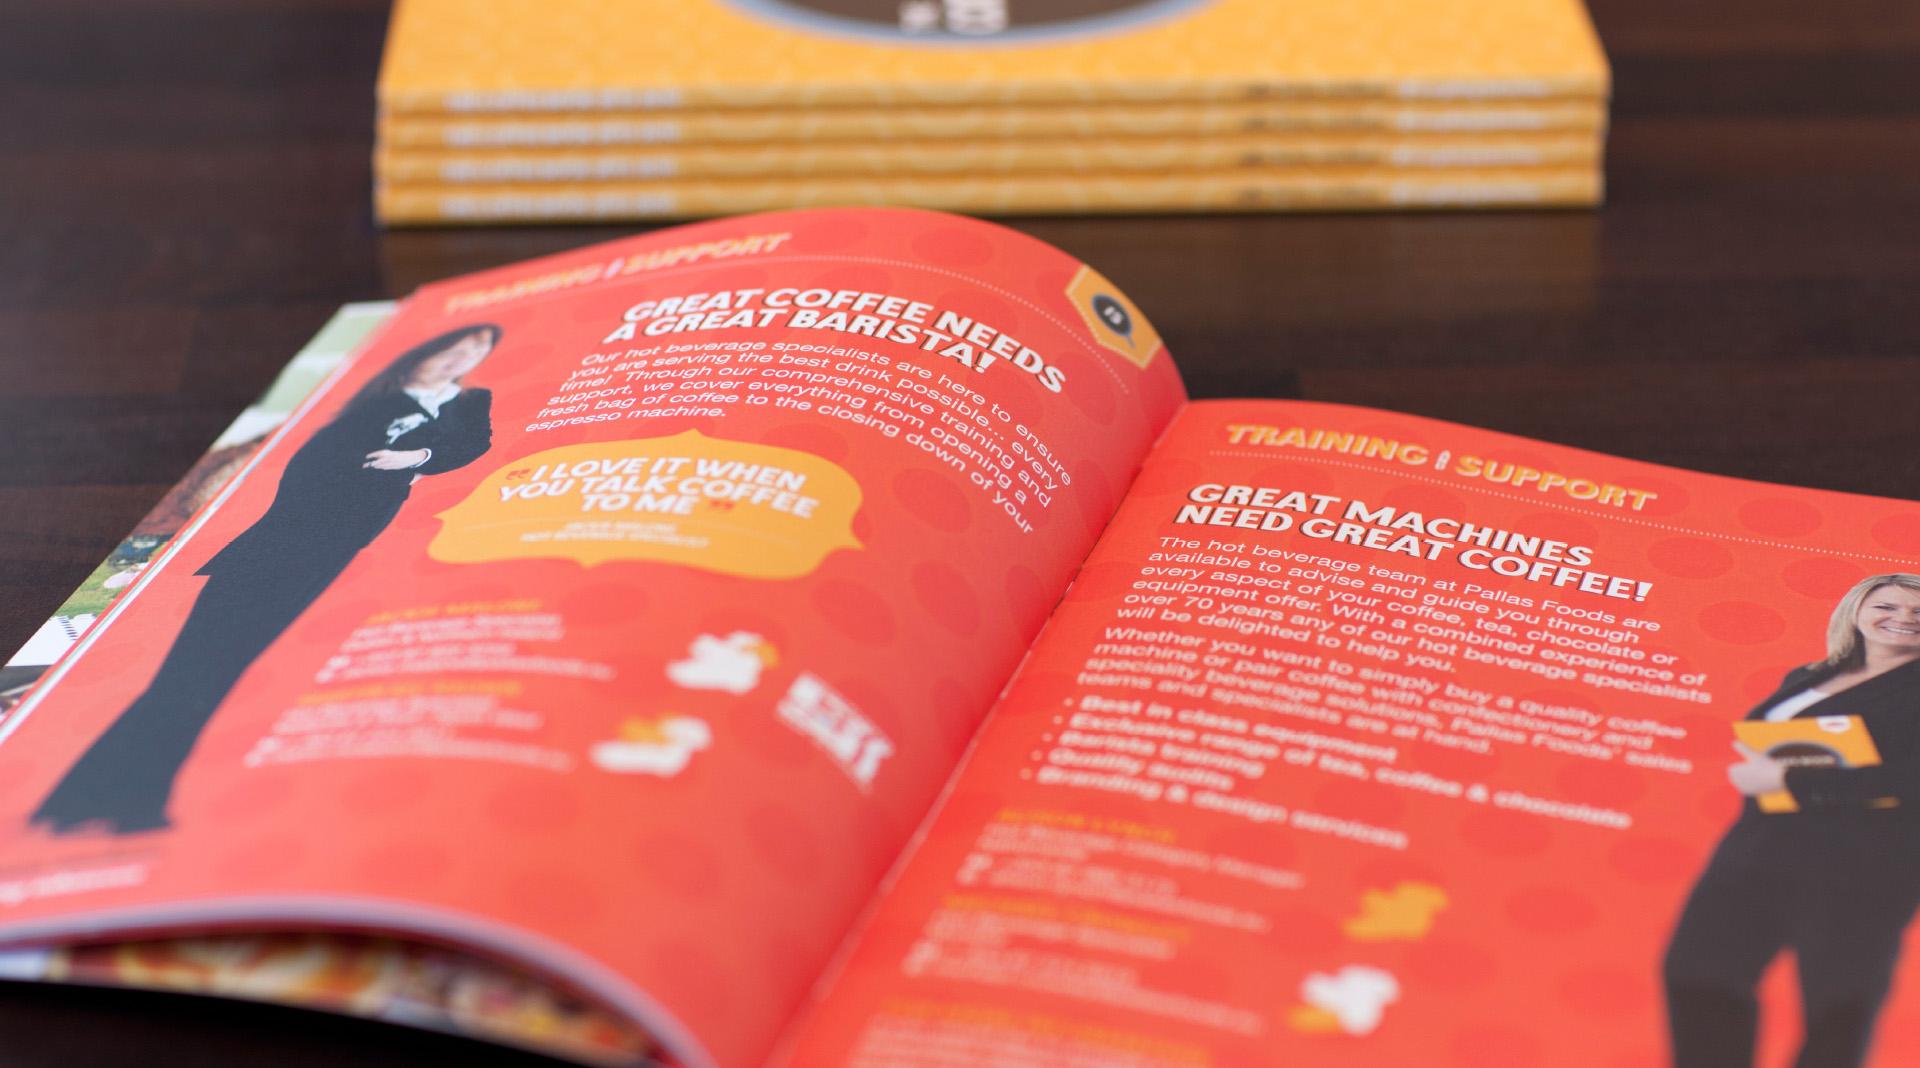 Pallas foods coffee book design detailed spread